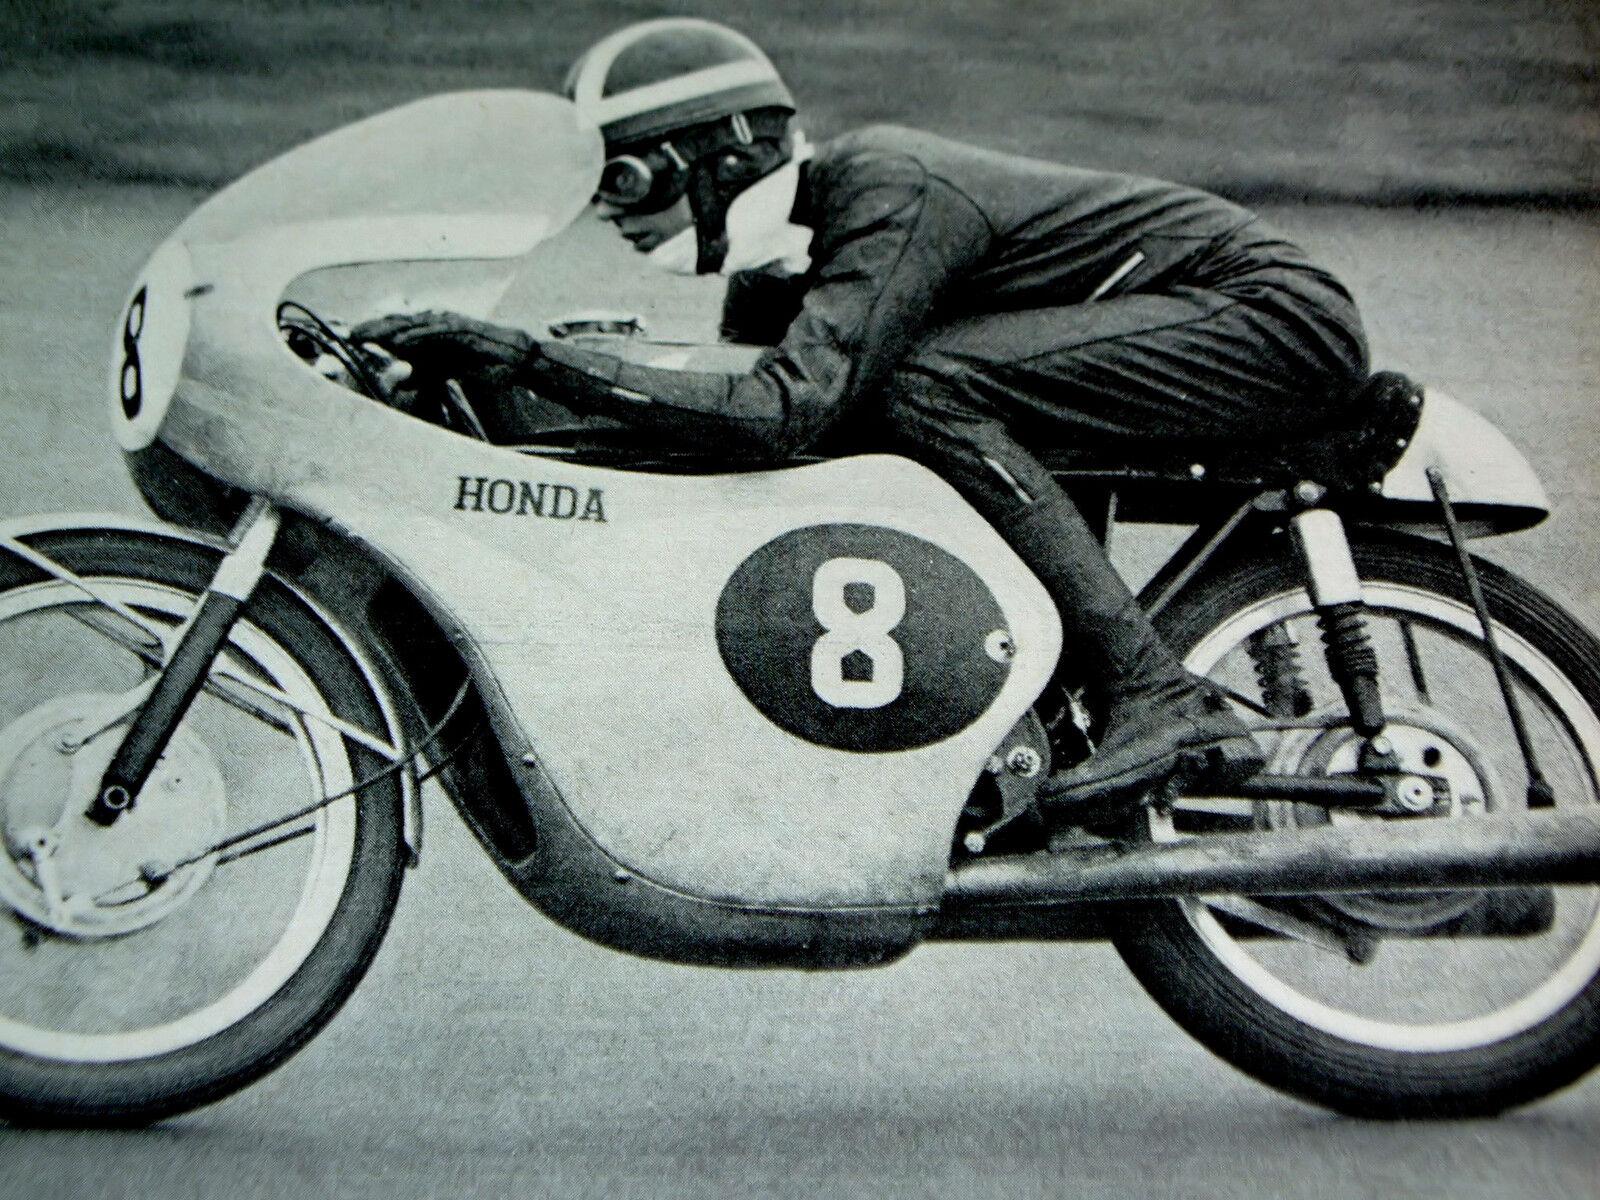 1966 honda grand prix road racing/125cc engine/motorcycle/1967